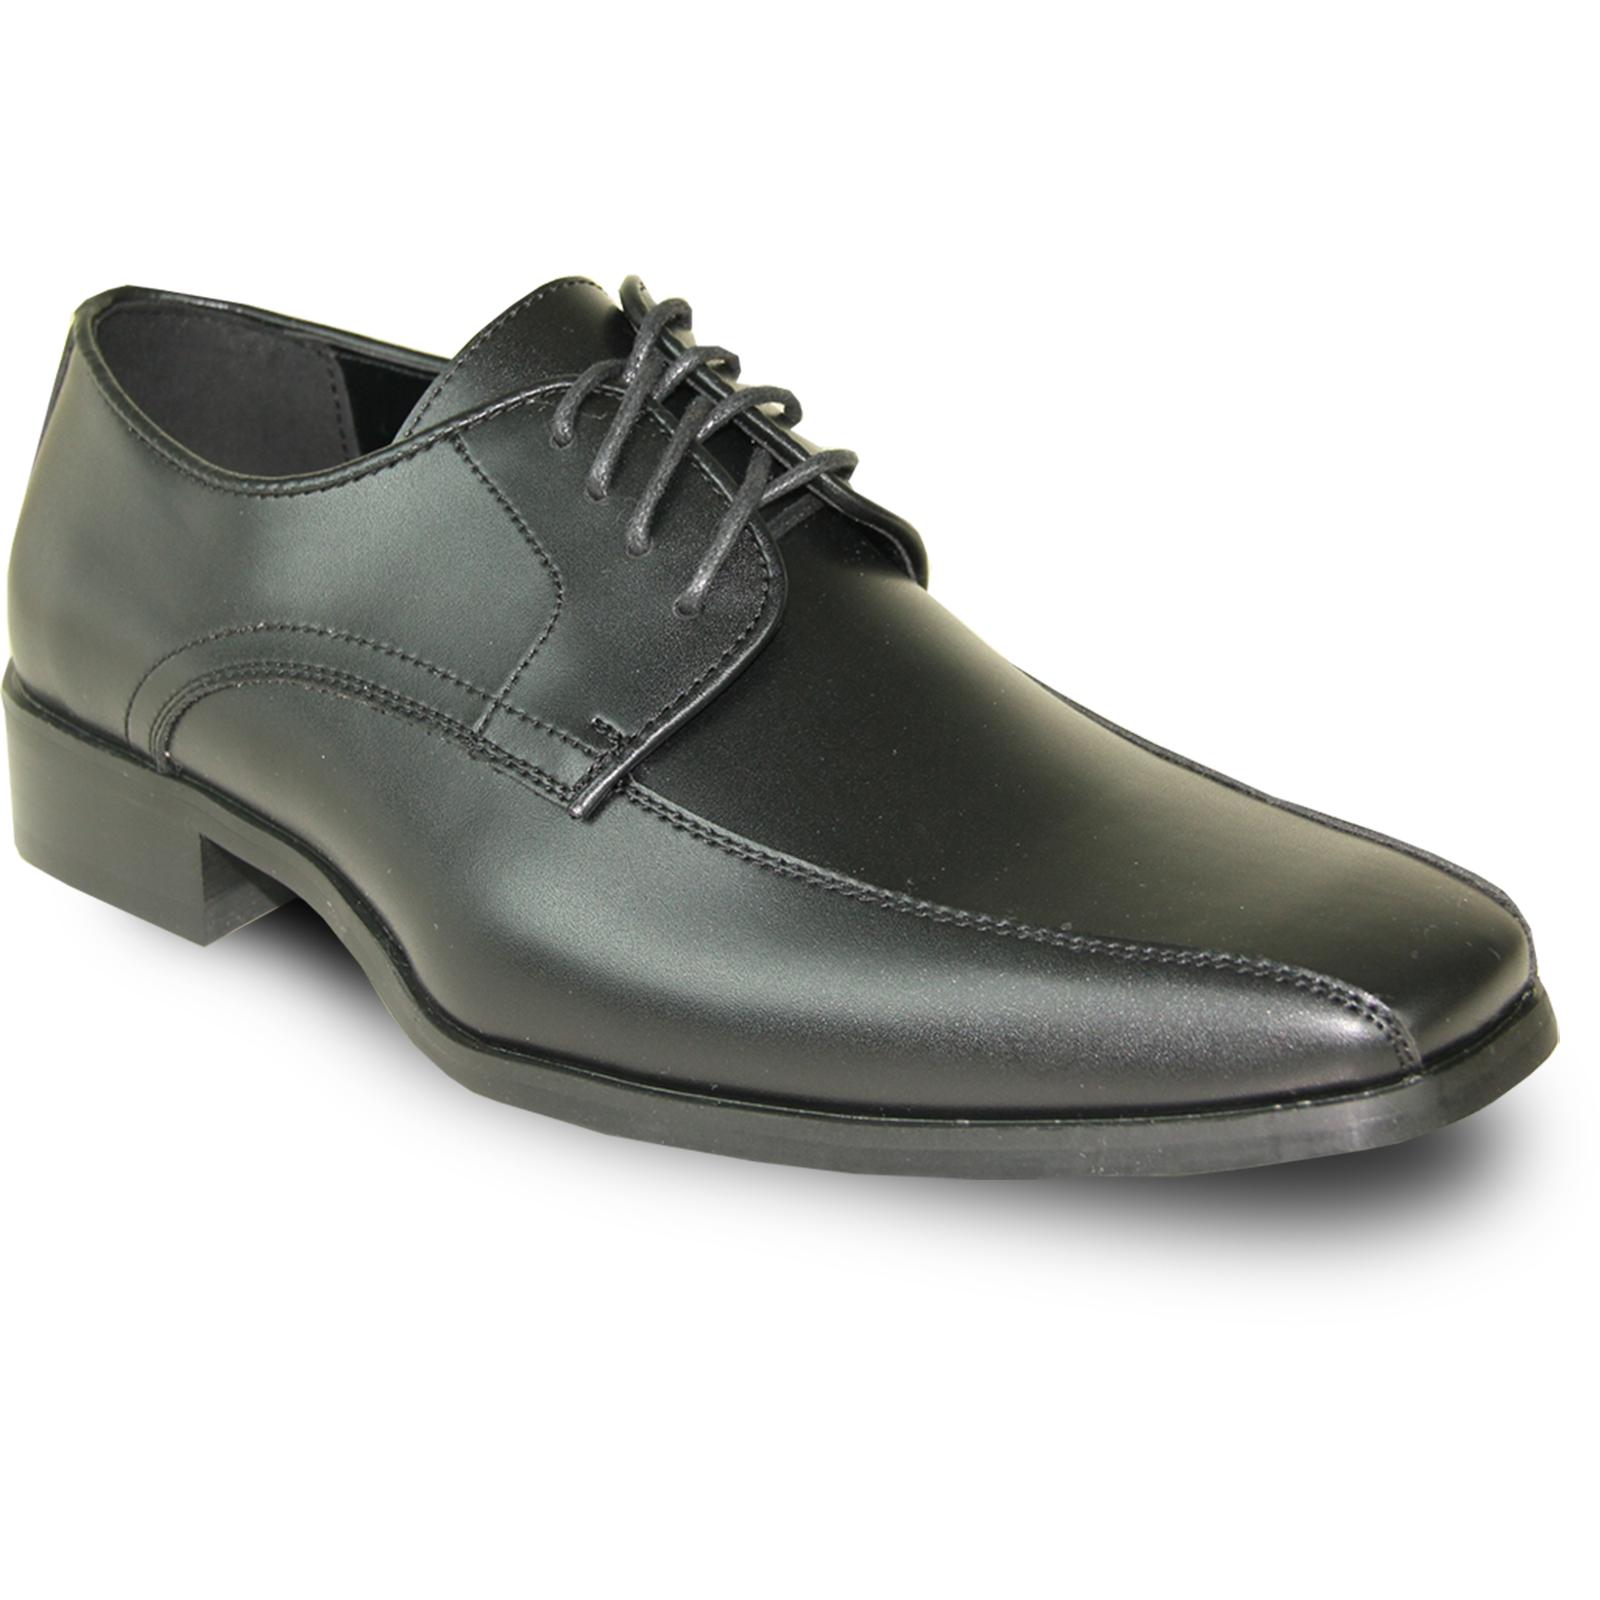 VANGELO Men's Tux-5 Black Matte Dress Oxford - Wide Width Available